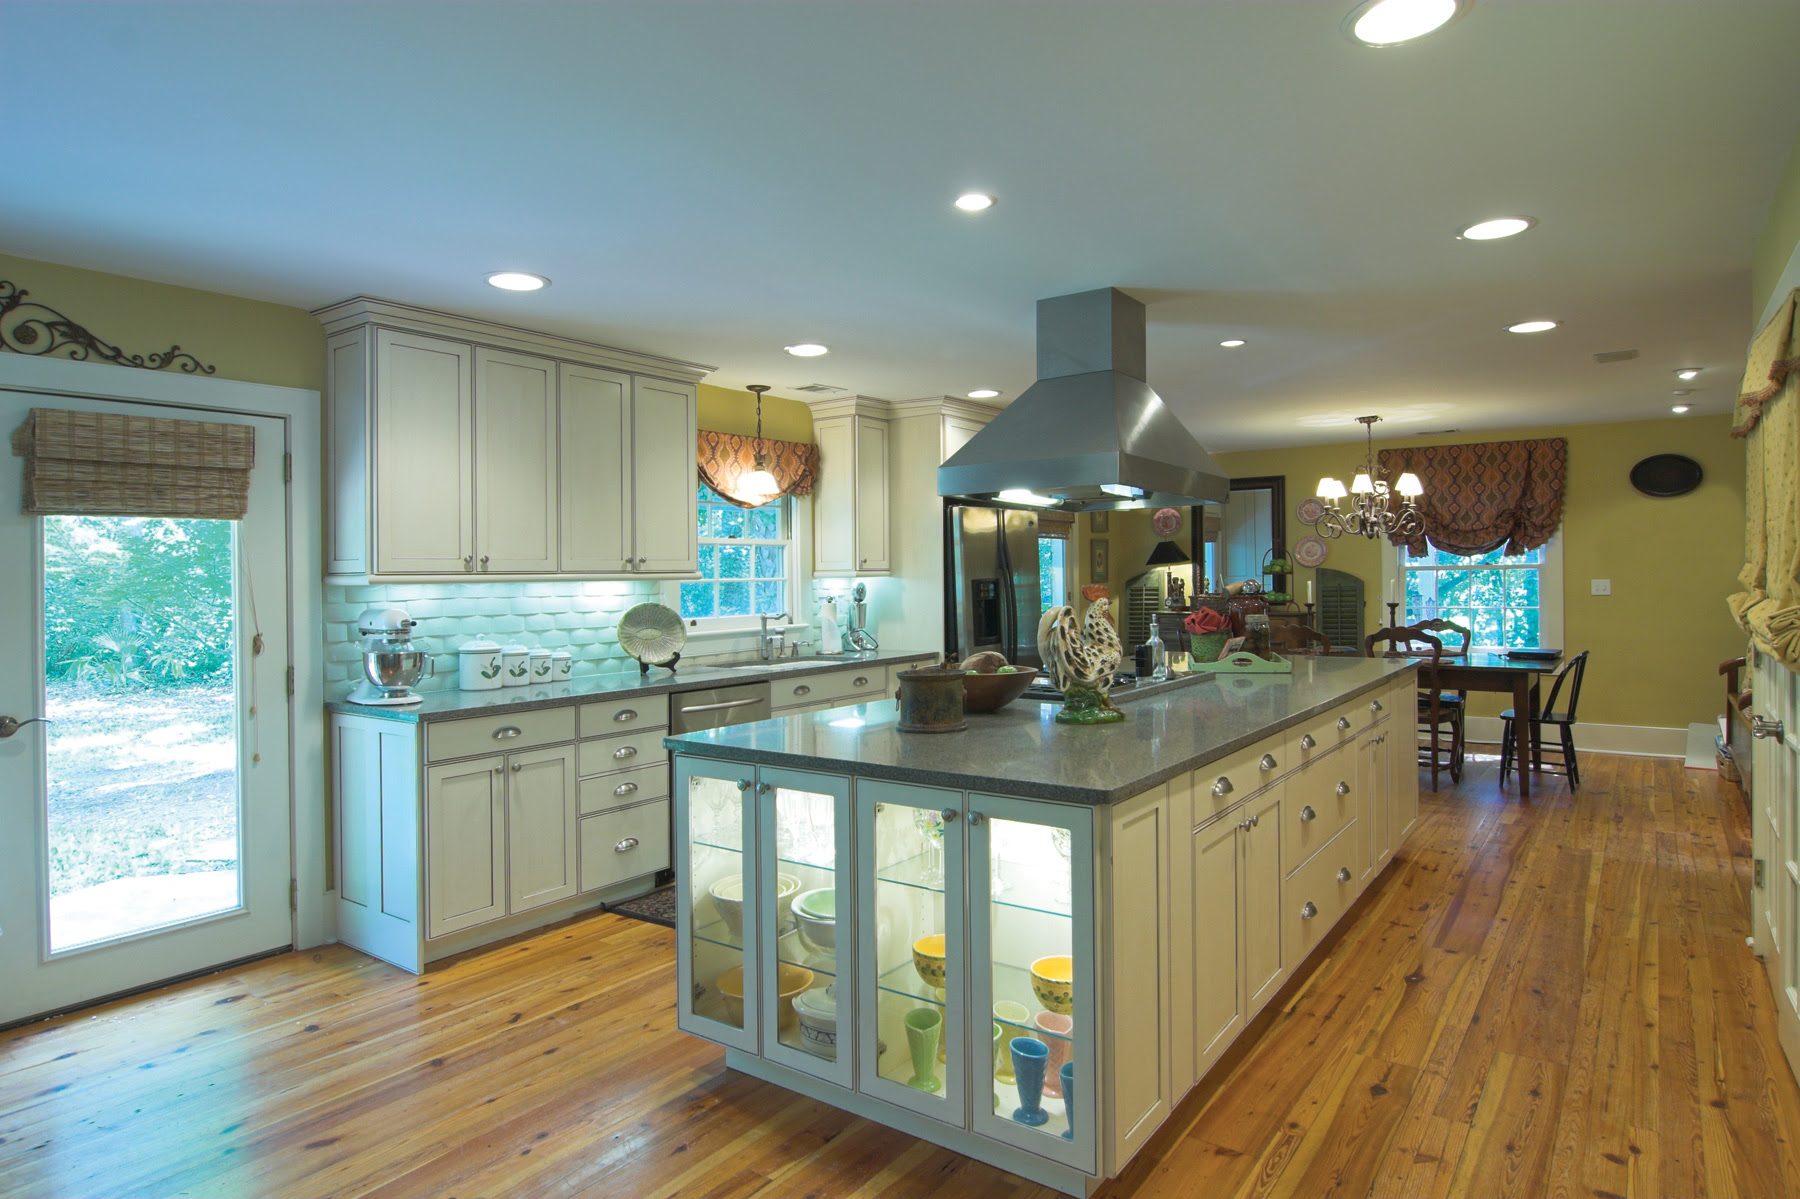 Kitchen with Under CabiLighting